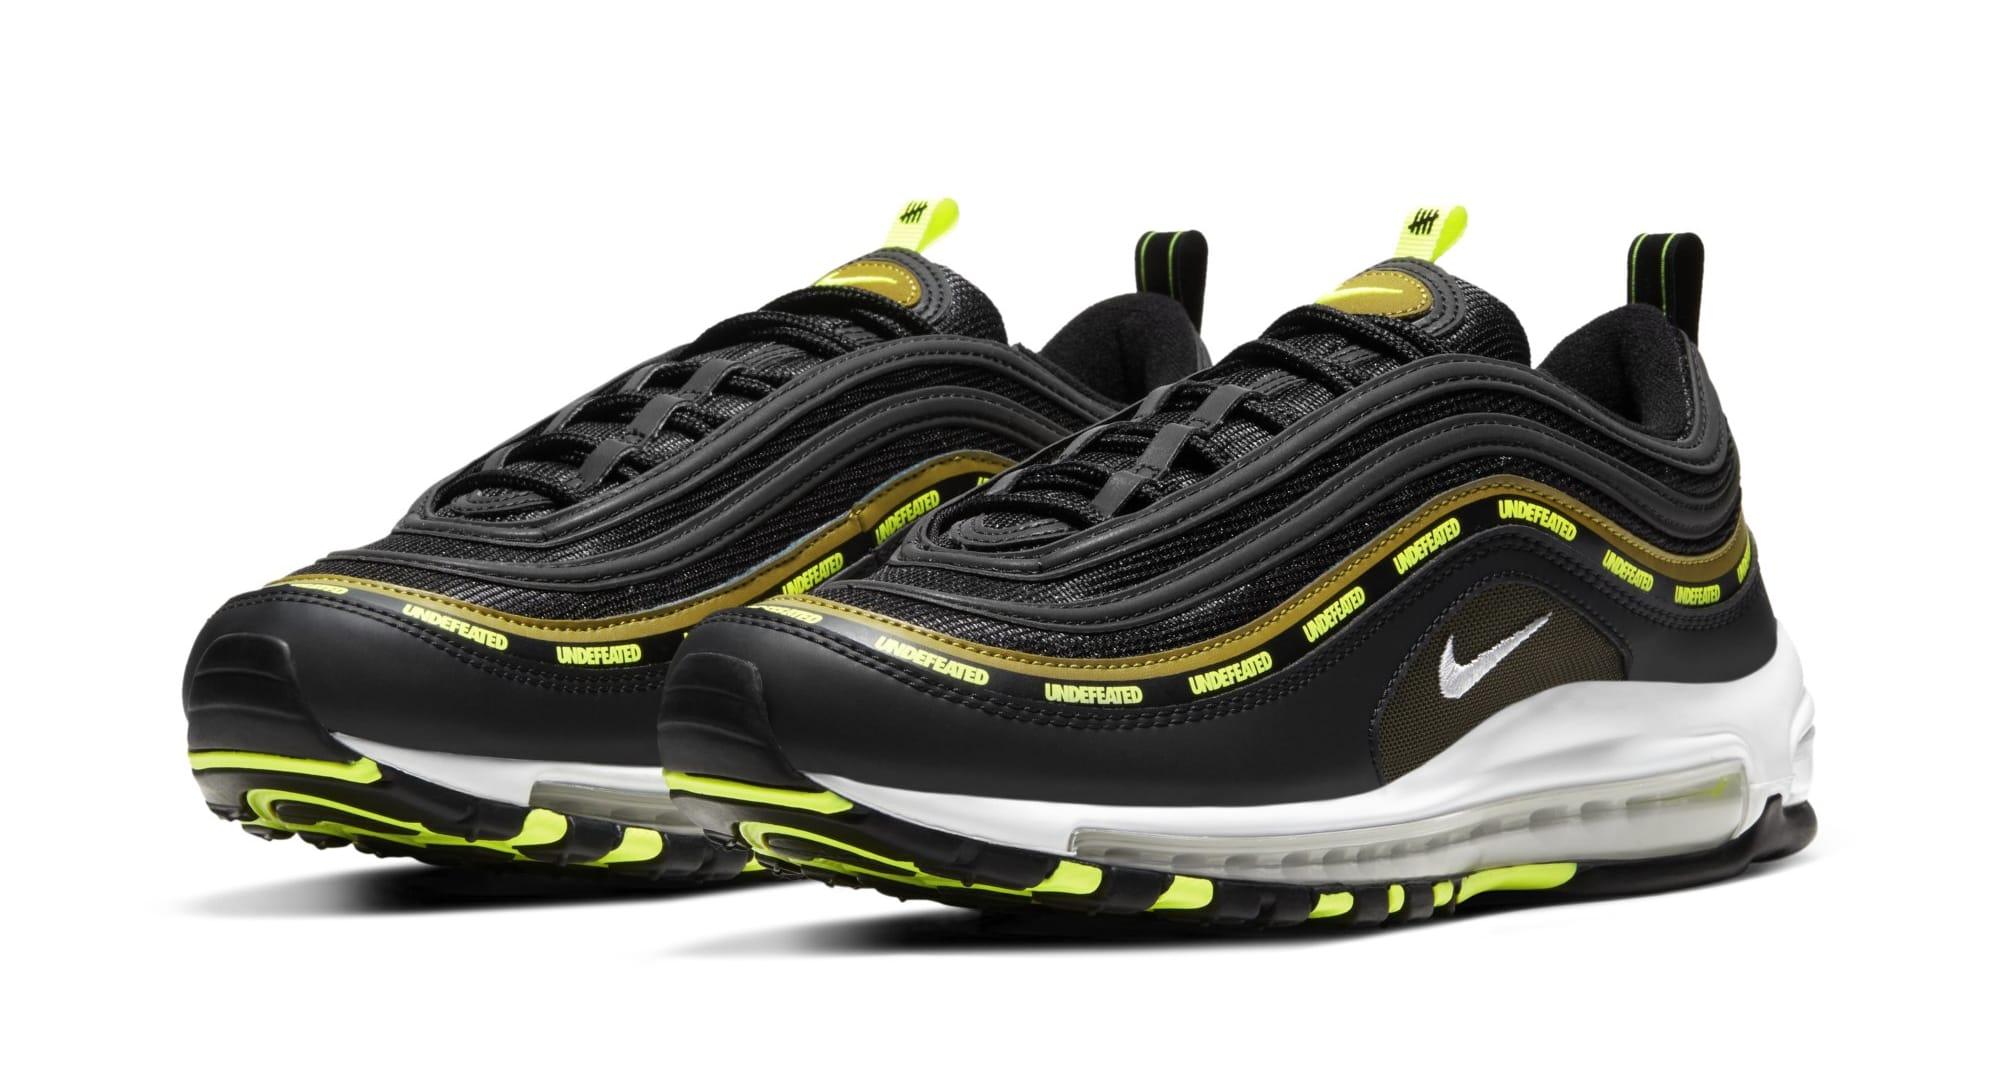 Undefeated x Nike Air Max 97 'Black/Volt' DC4830-001 (Pair)